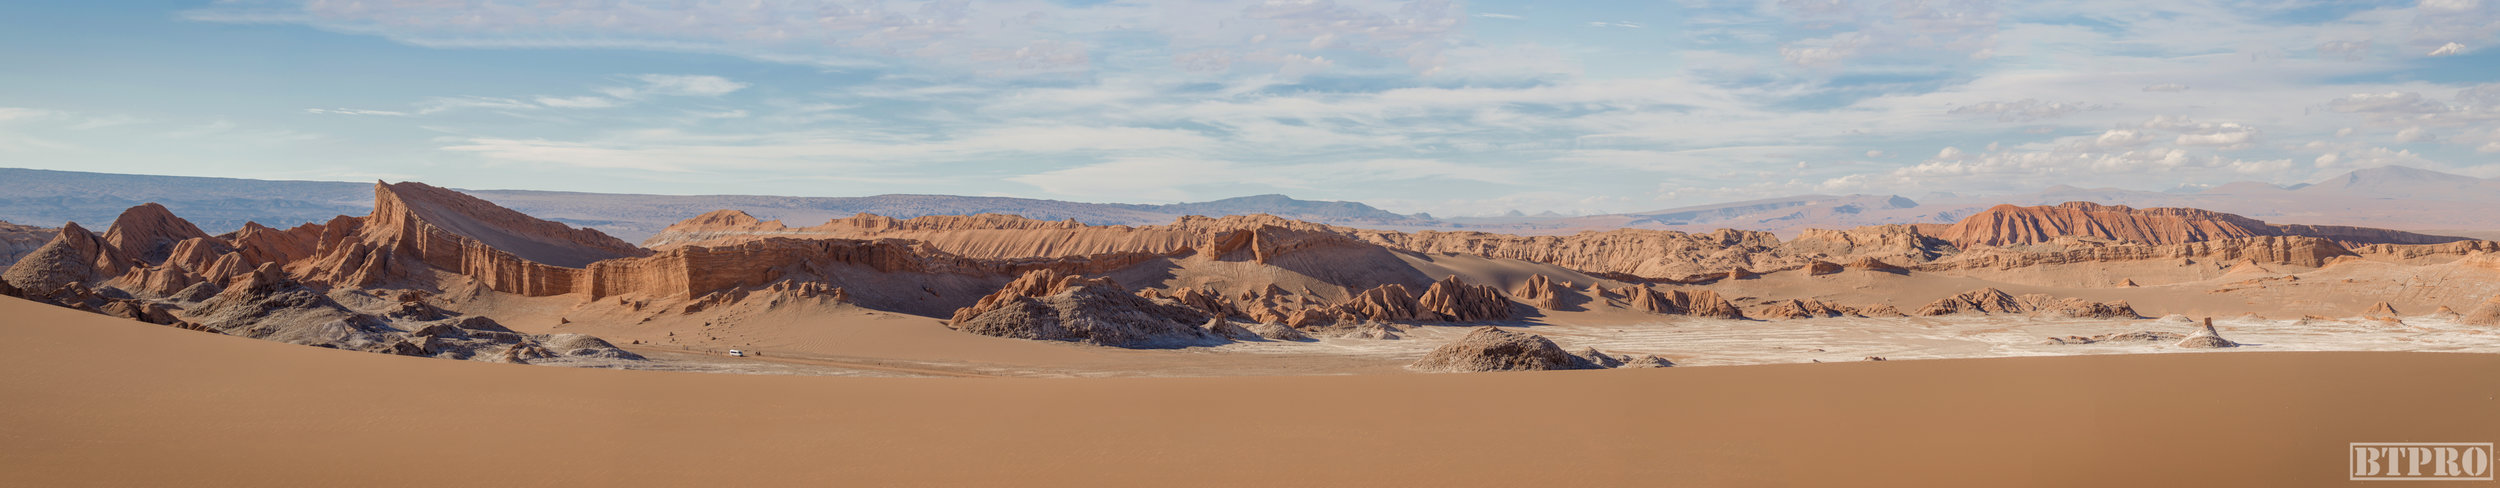 pano, atacama desert, travel, travel photography, desert, chile